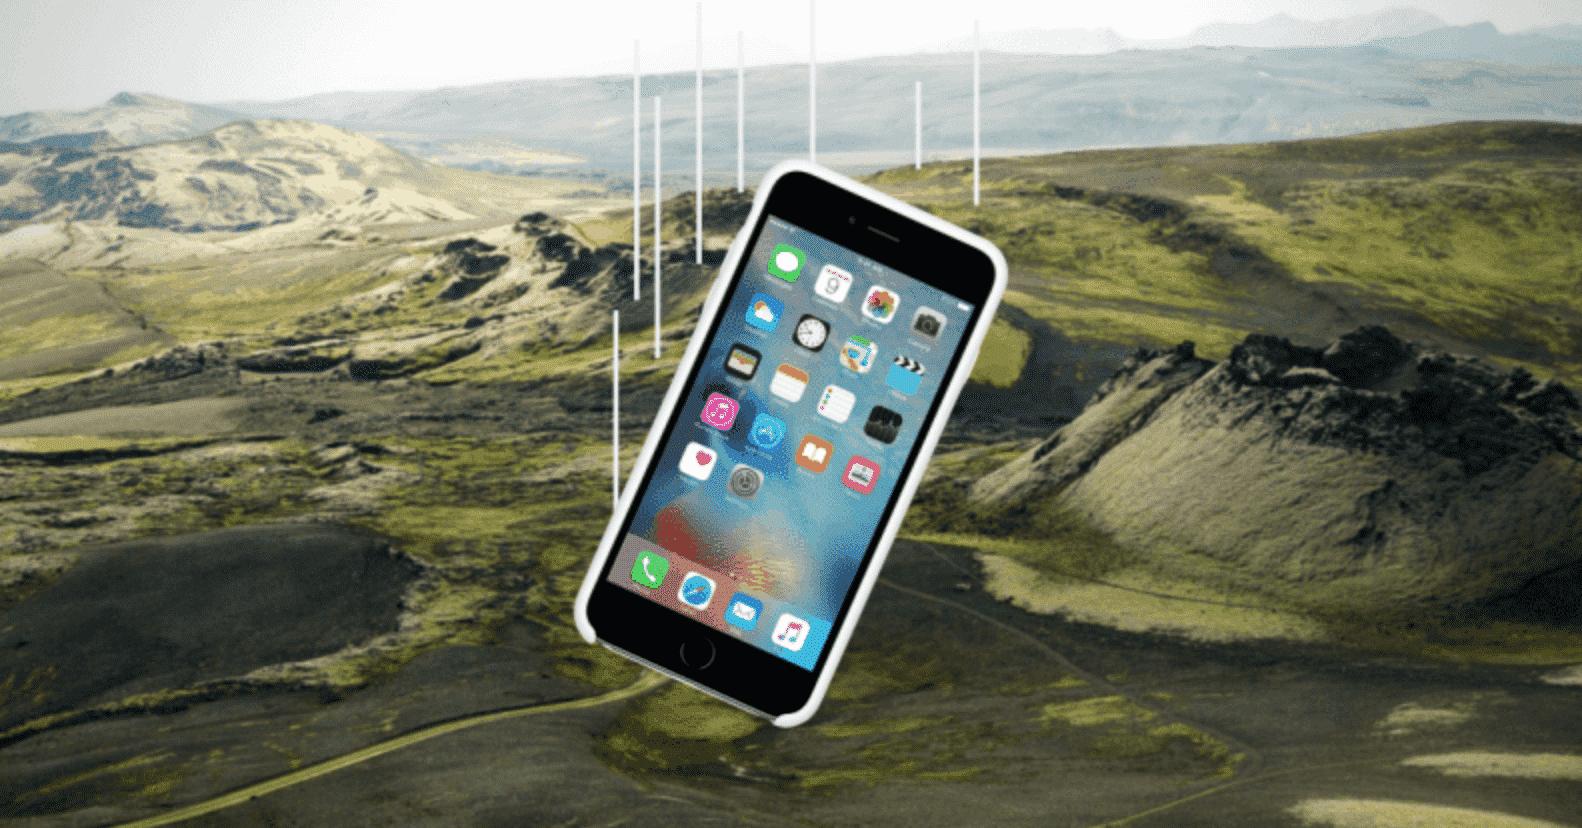 iPhone 6s Still Works Airplane icelandic Weather